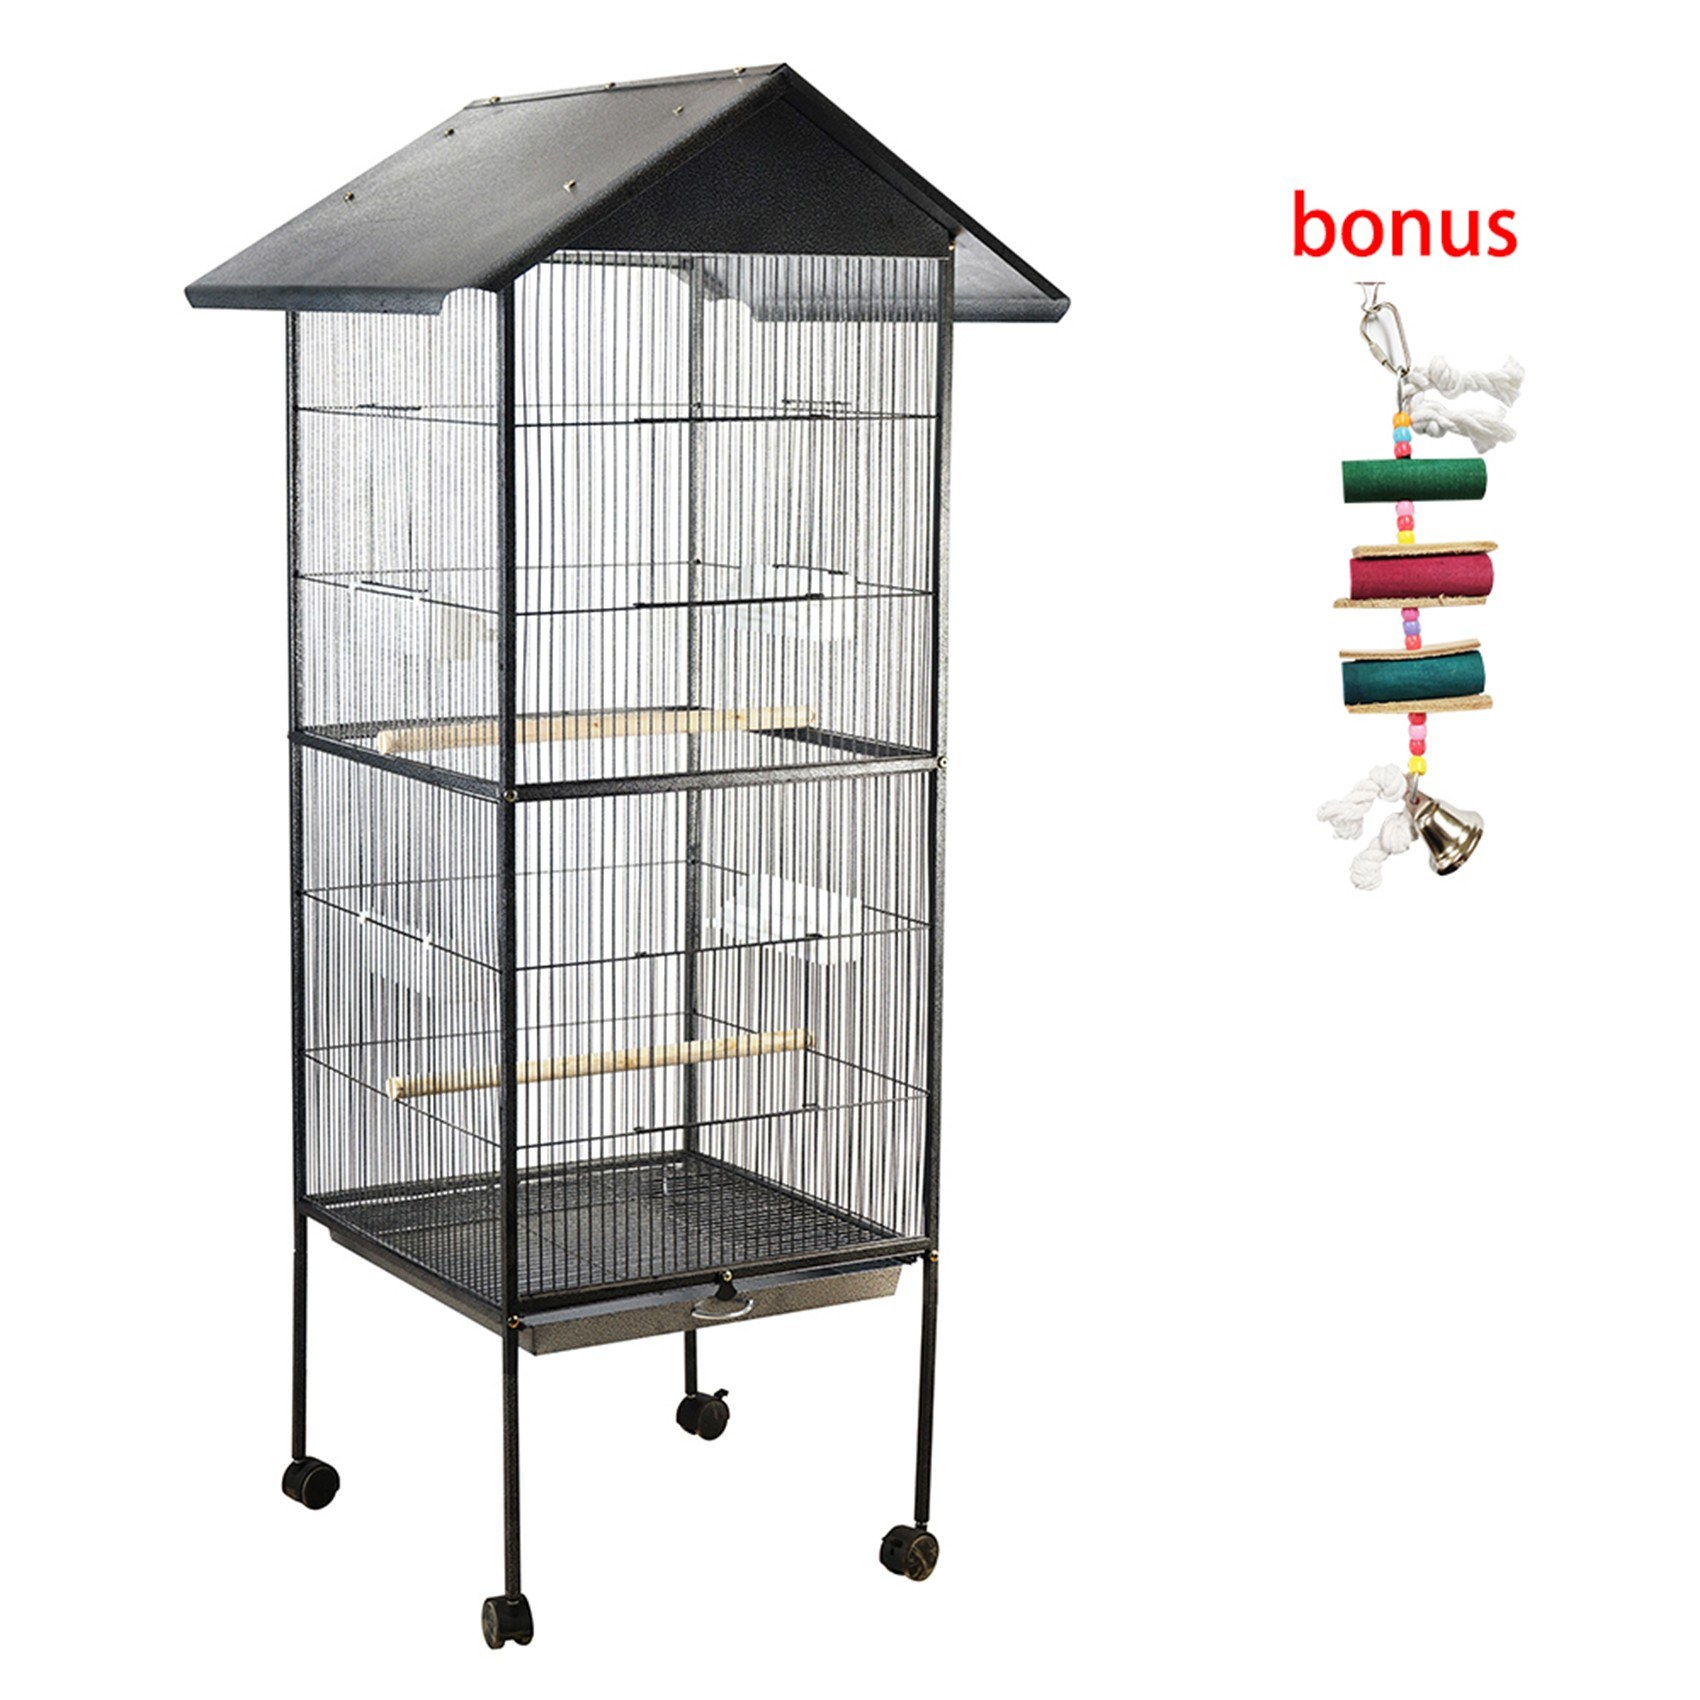 Tomtop - [EU Clearance Sale] 46% OFF Metal Pet Bird Cage, $76.99 (Inclusive of VAT)